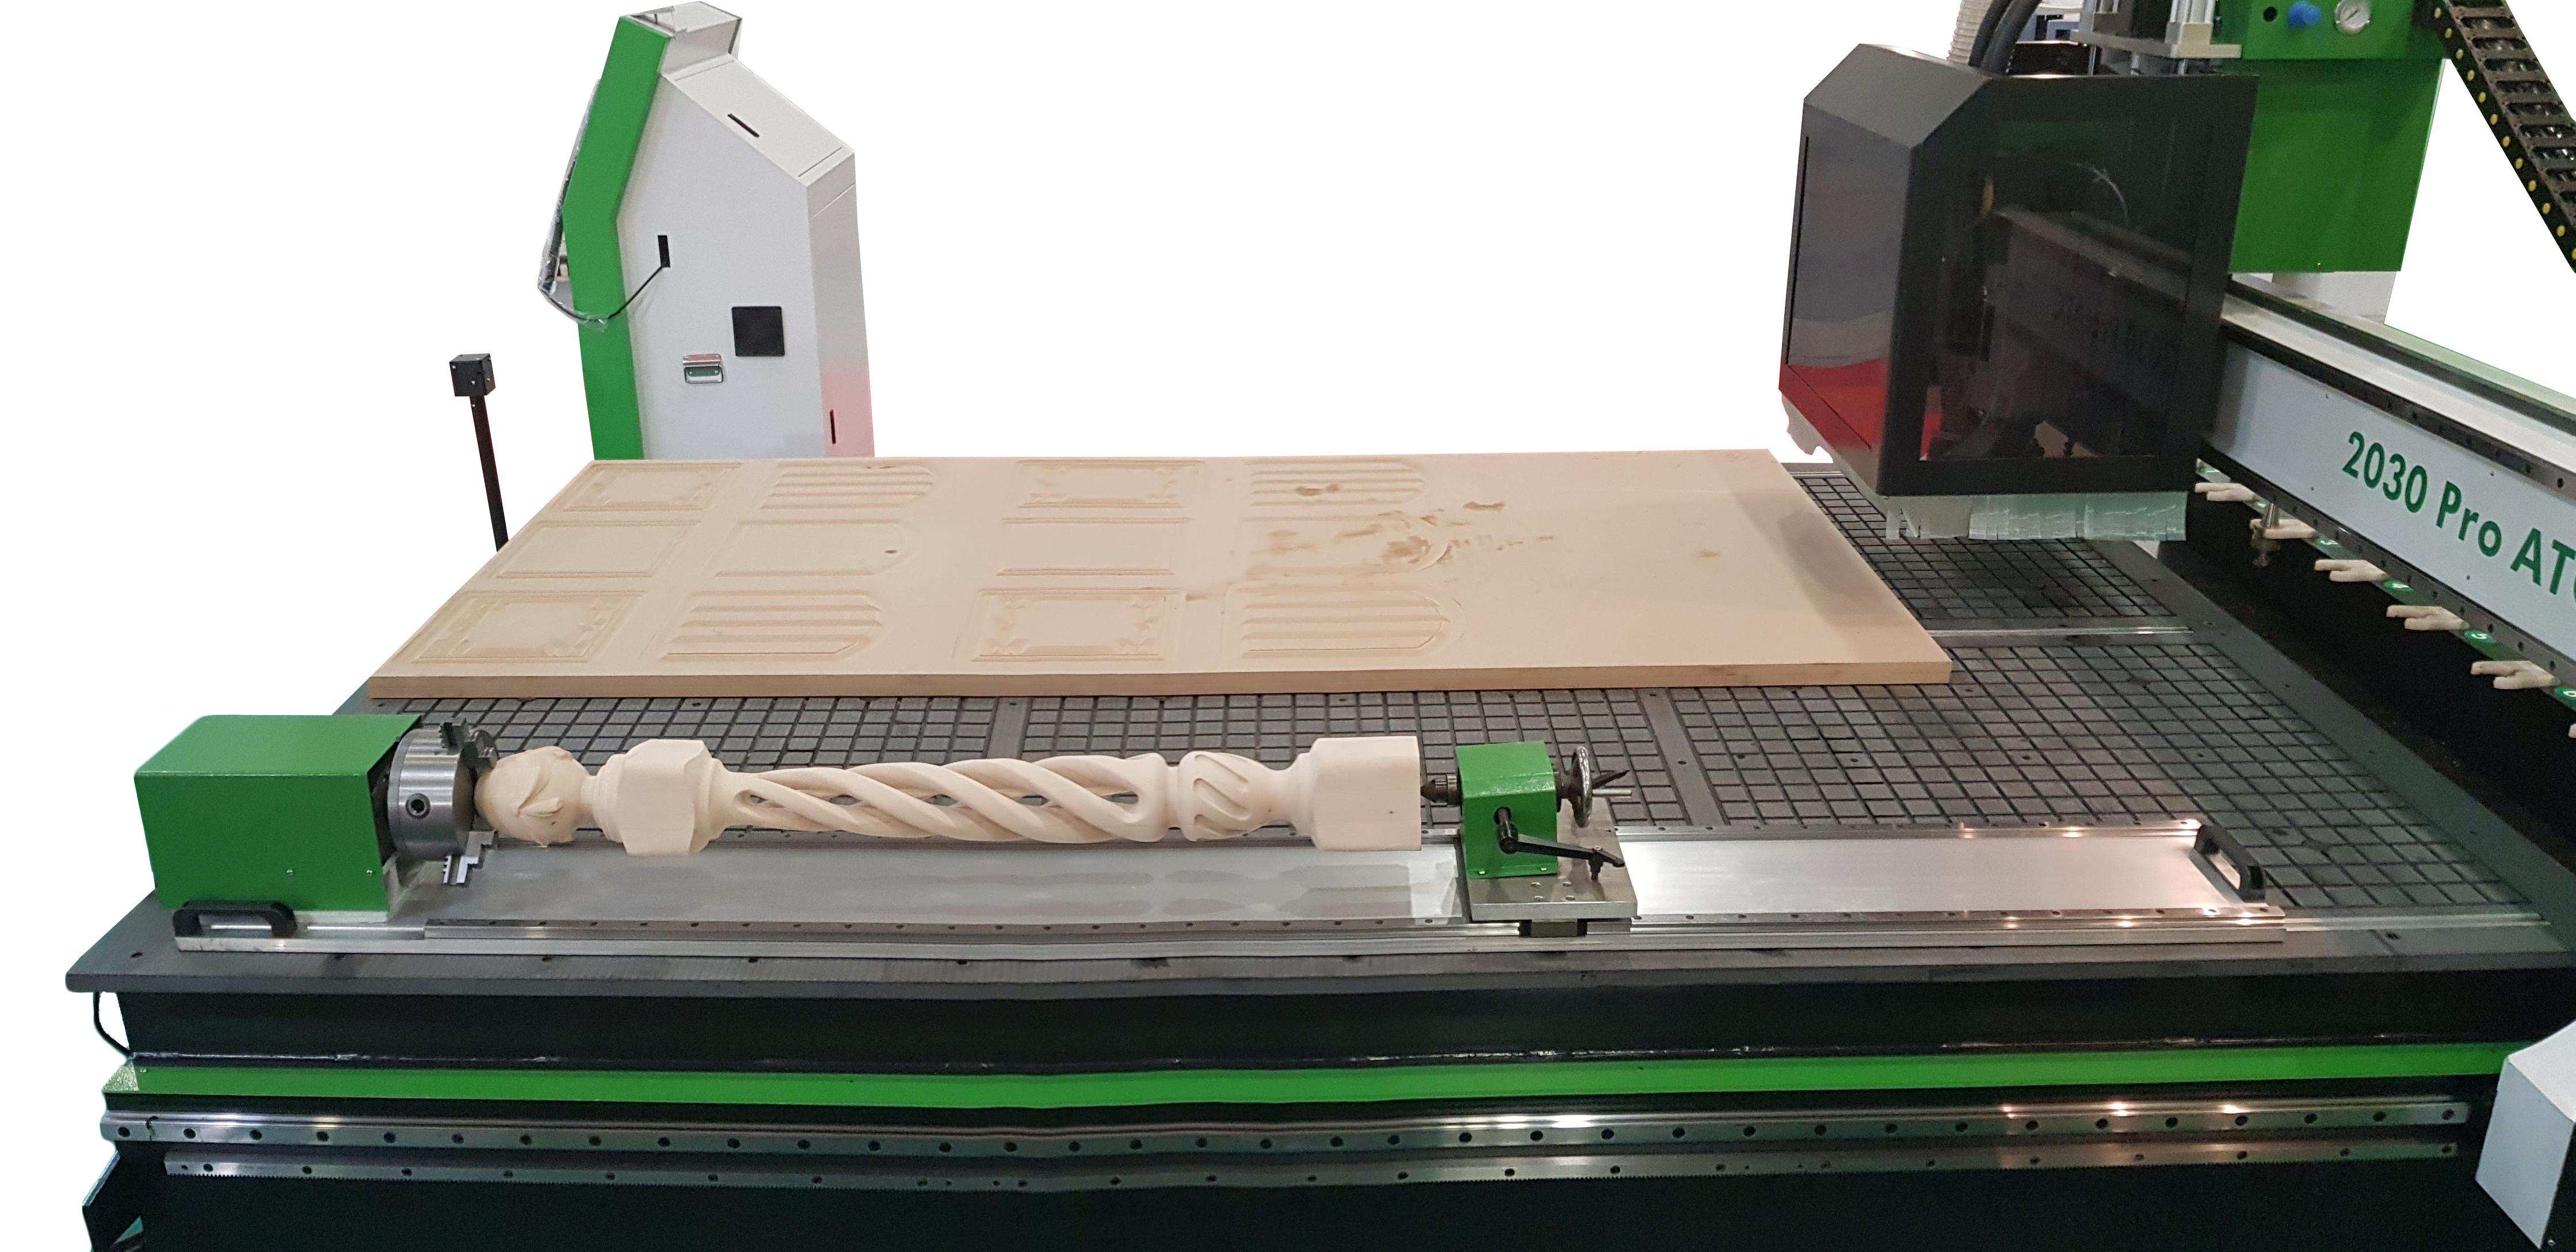 Router CNC 2030 Pro ATC